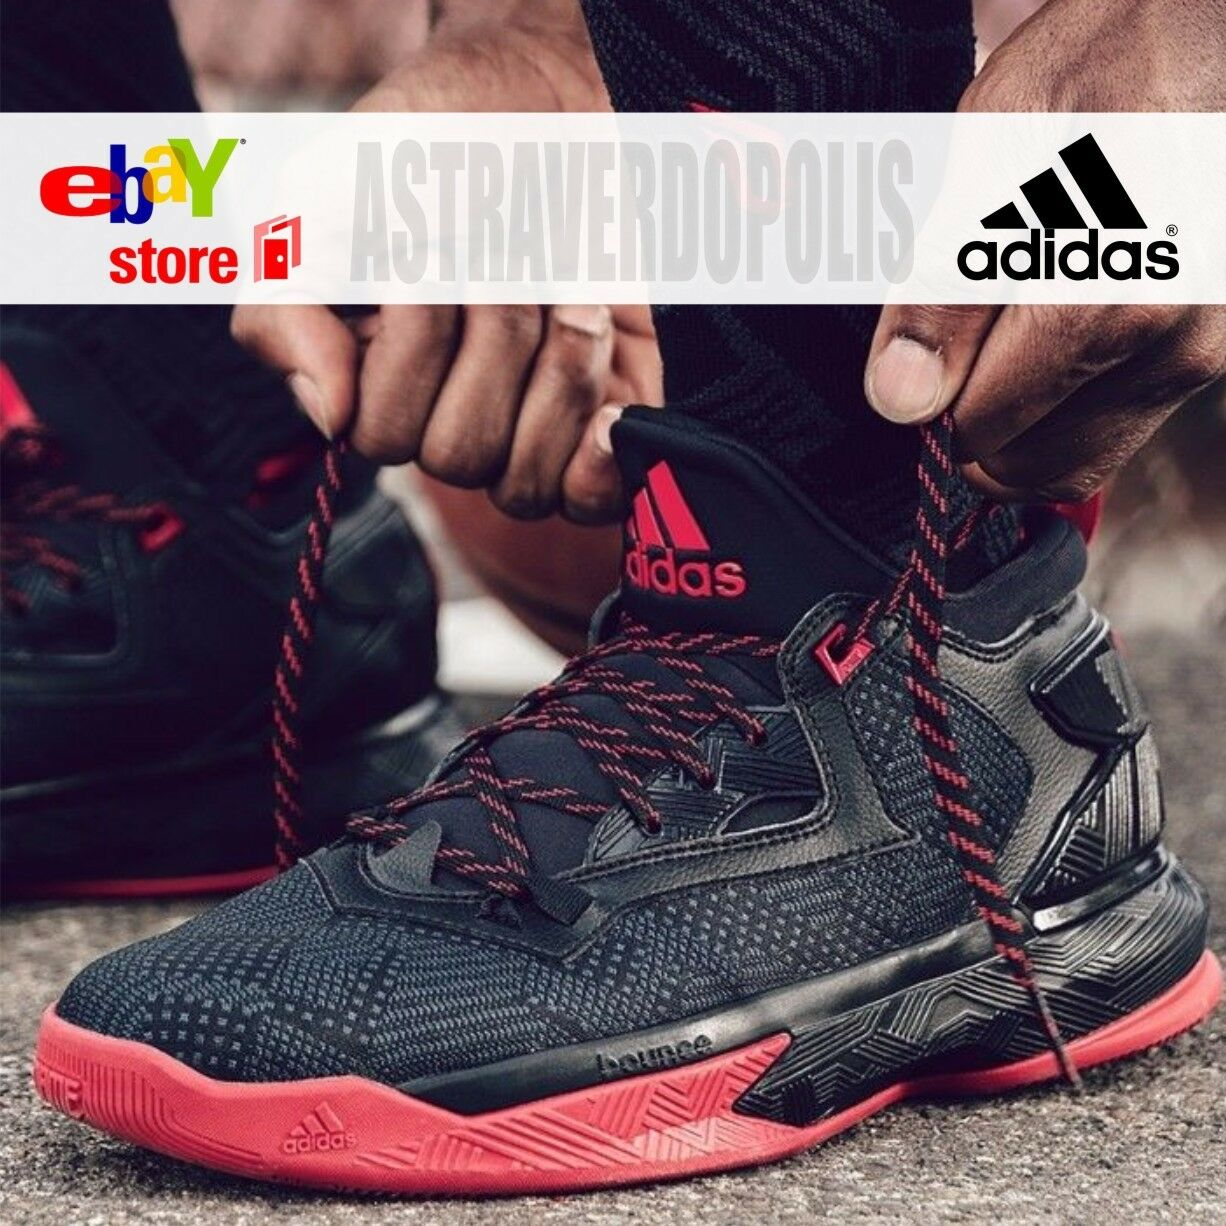 Adidas d lillard 2.0 pazzi per il basket noi Uomo scarpe nere kobe rimbalzare noi basket 10,5 11 68b131